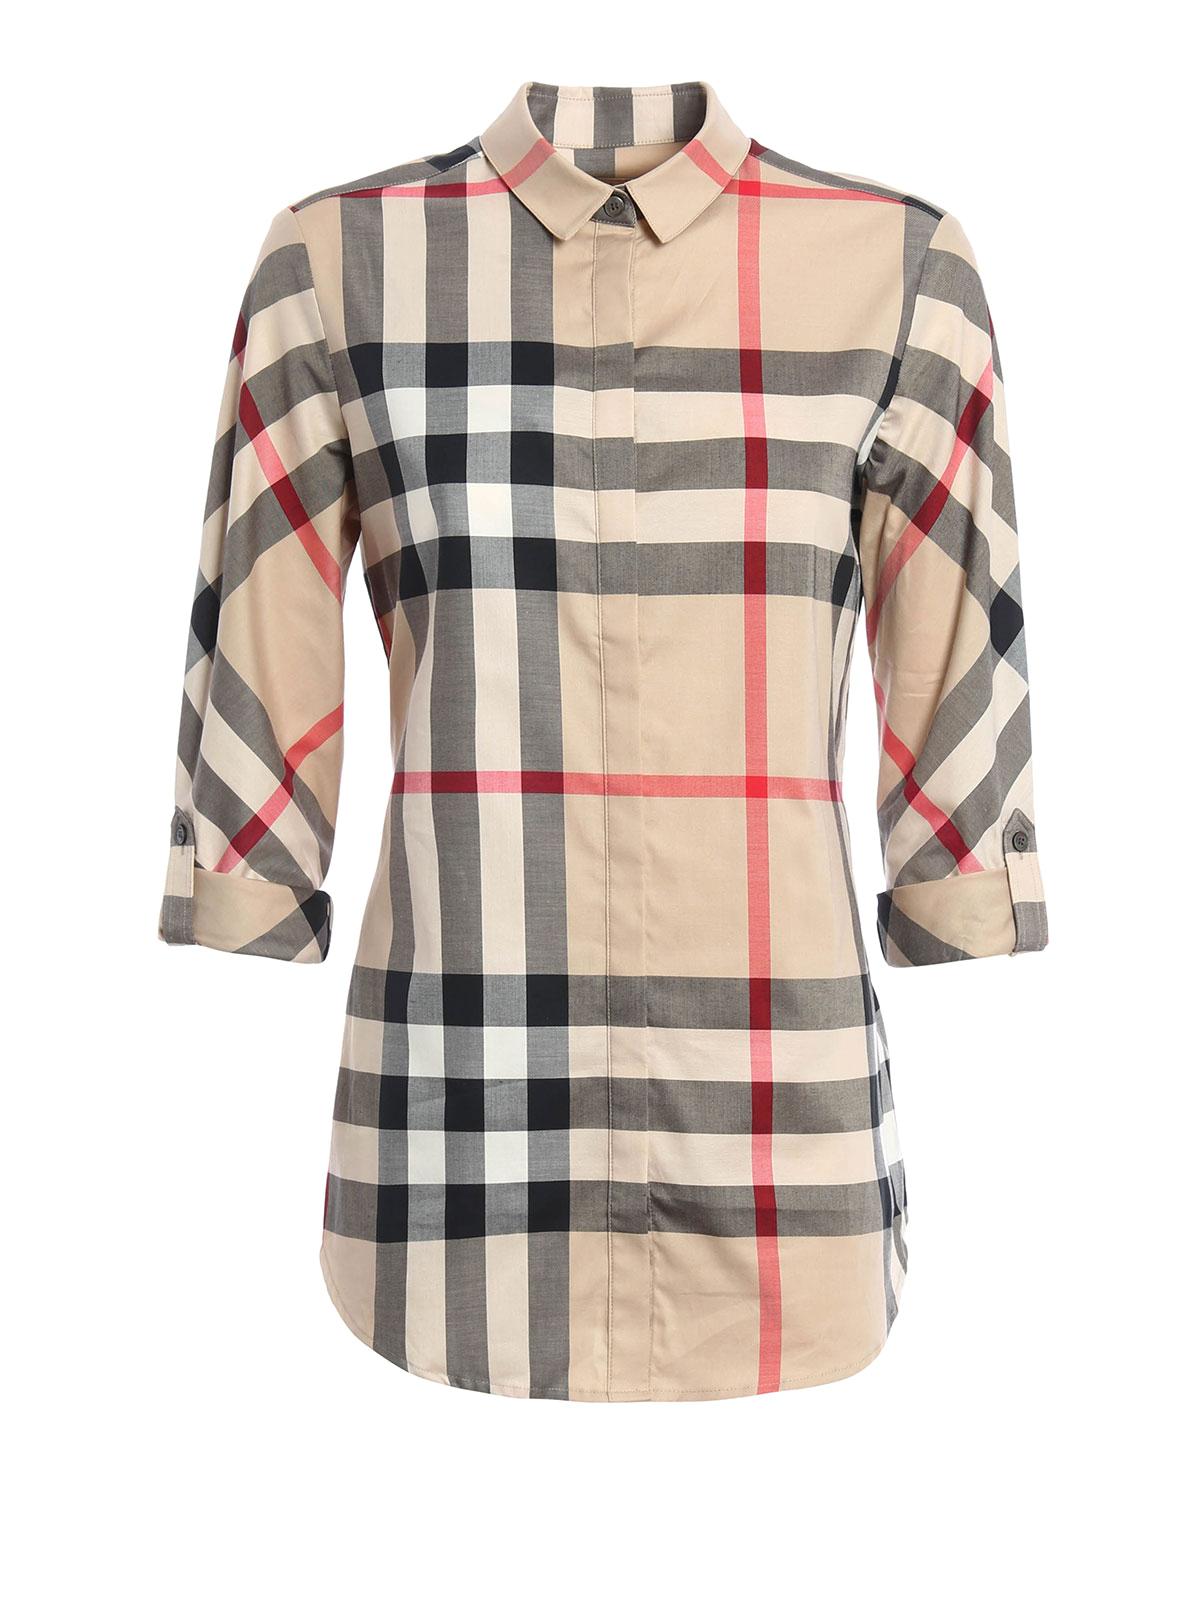 Para Marrón Camisa Mujer 3918091 Camisas Burberry qB18S